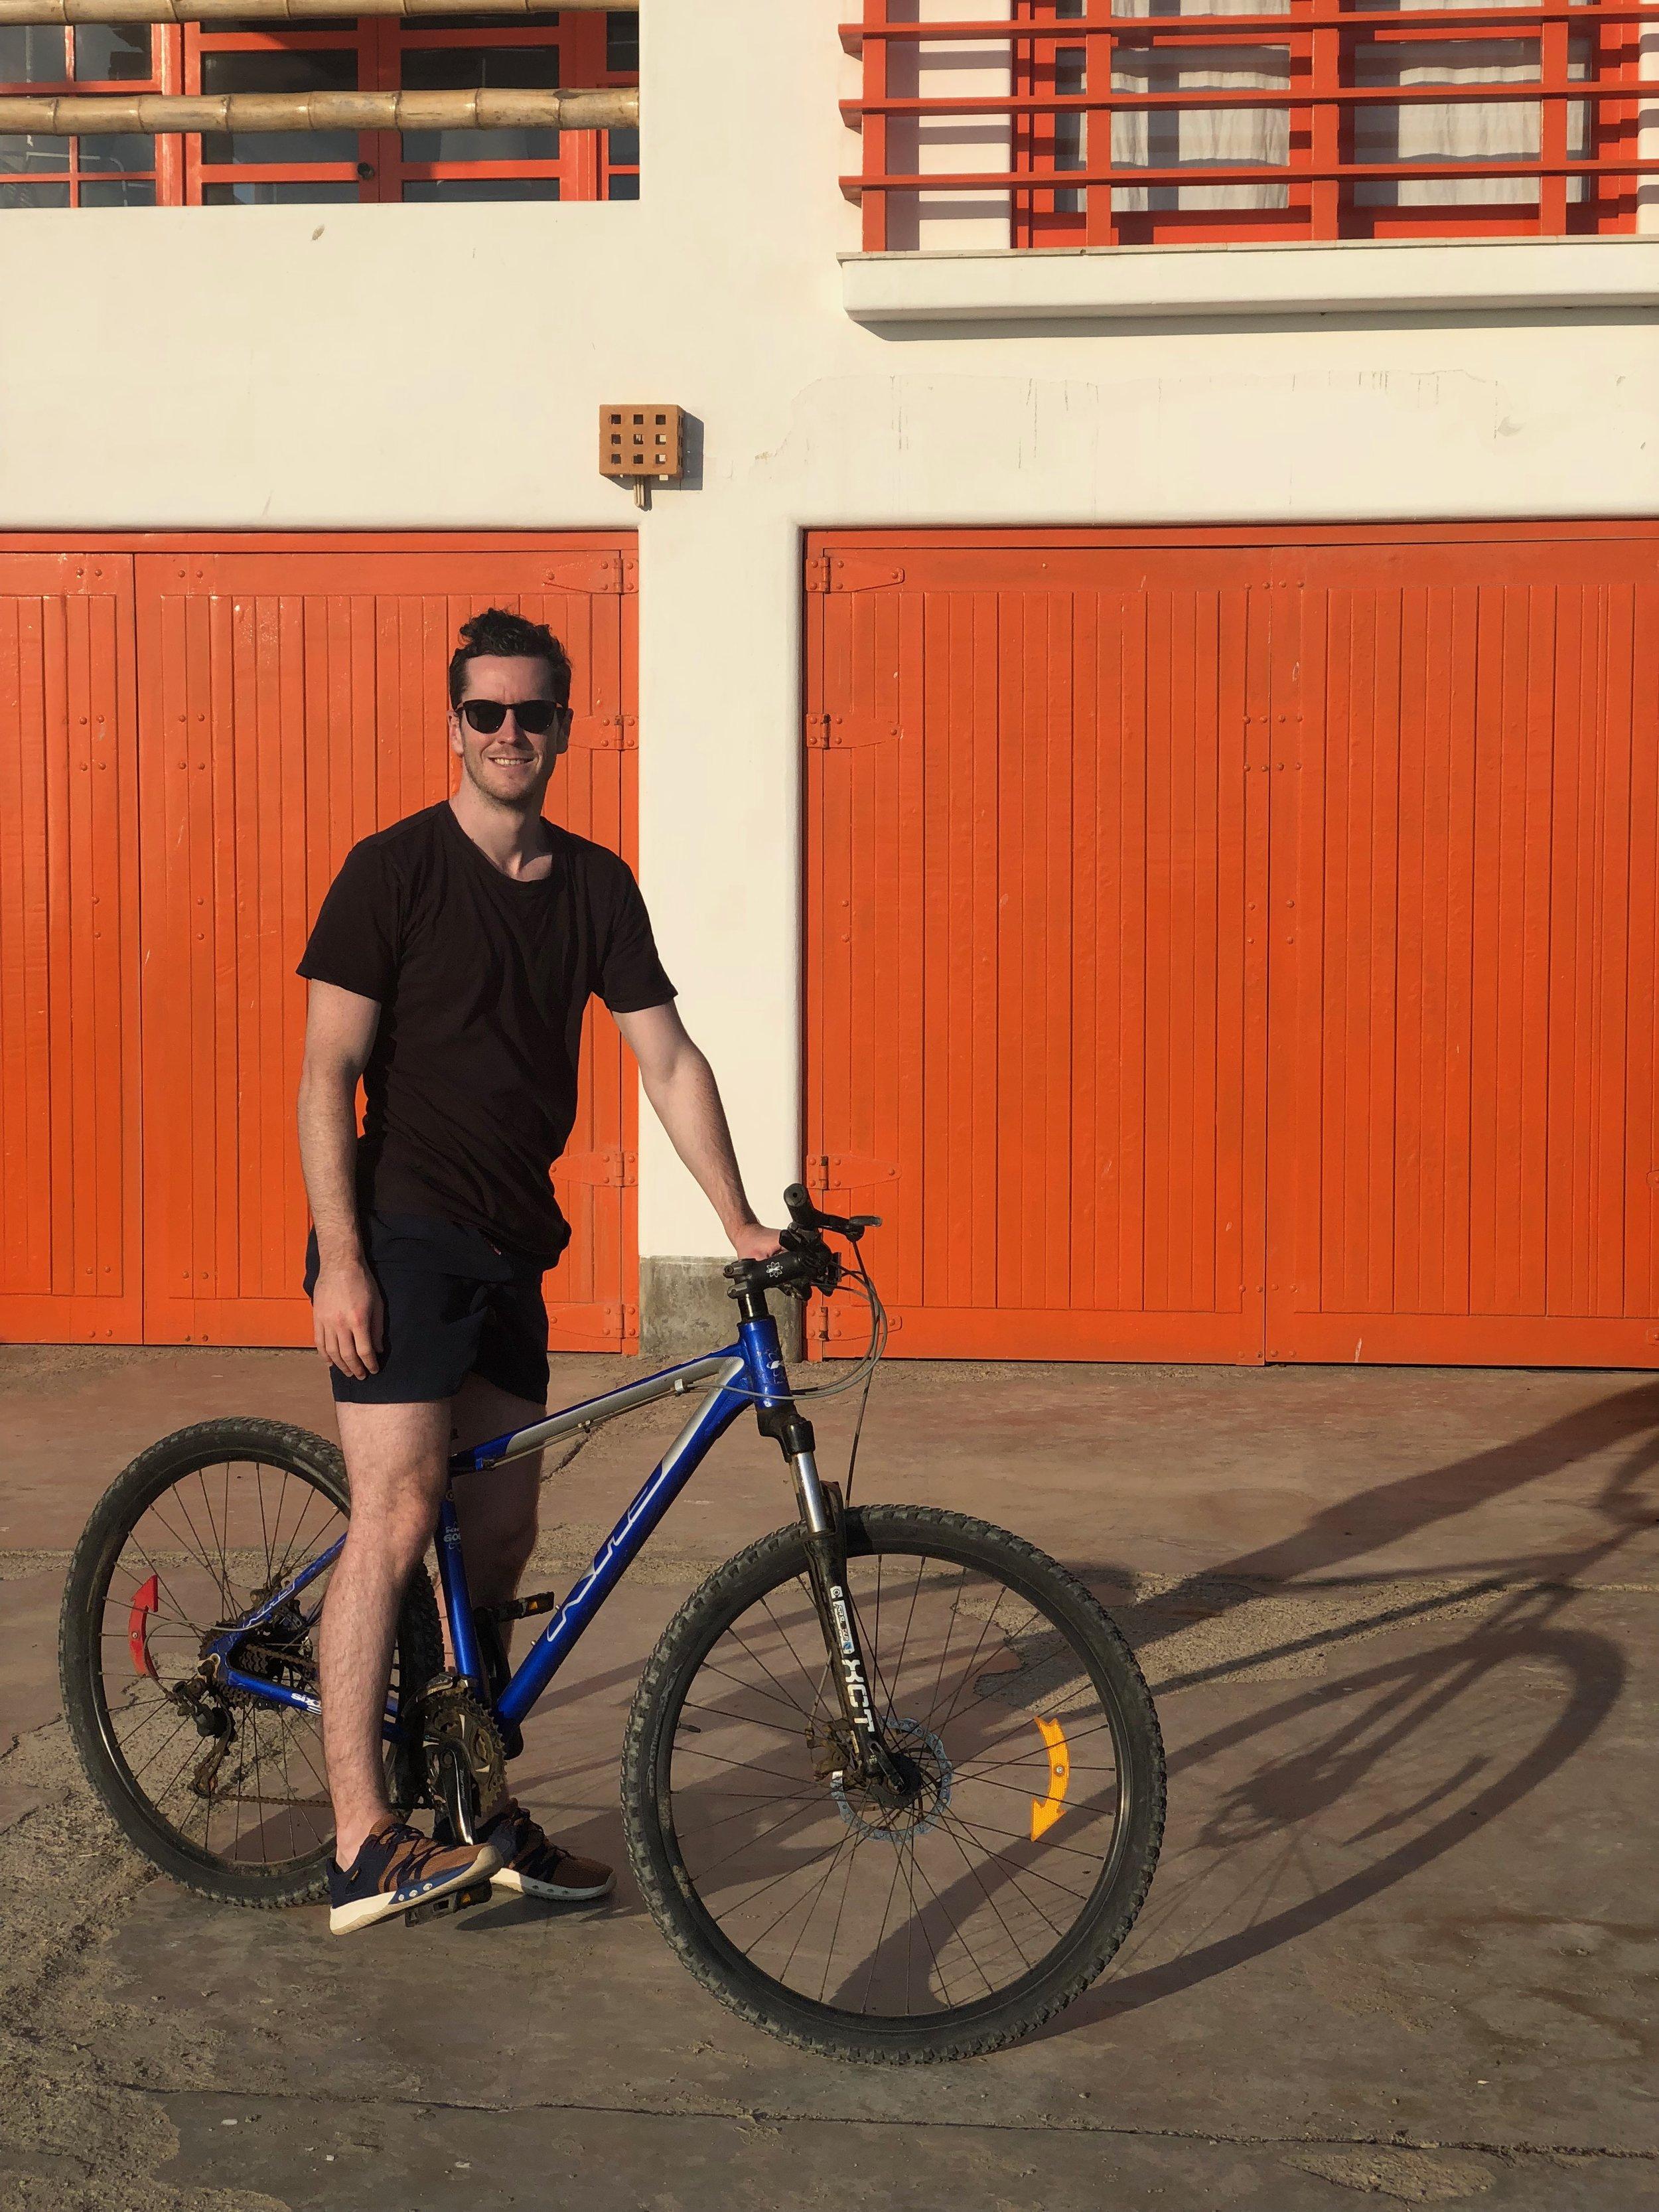 paracas-hotel-beach-peru-south-america- bikes